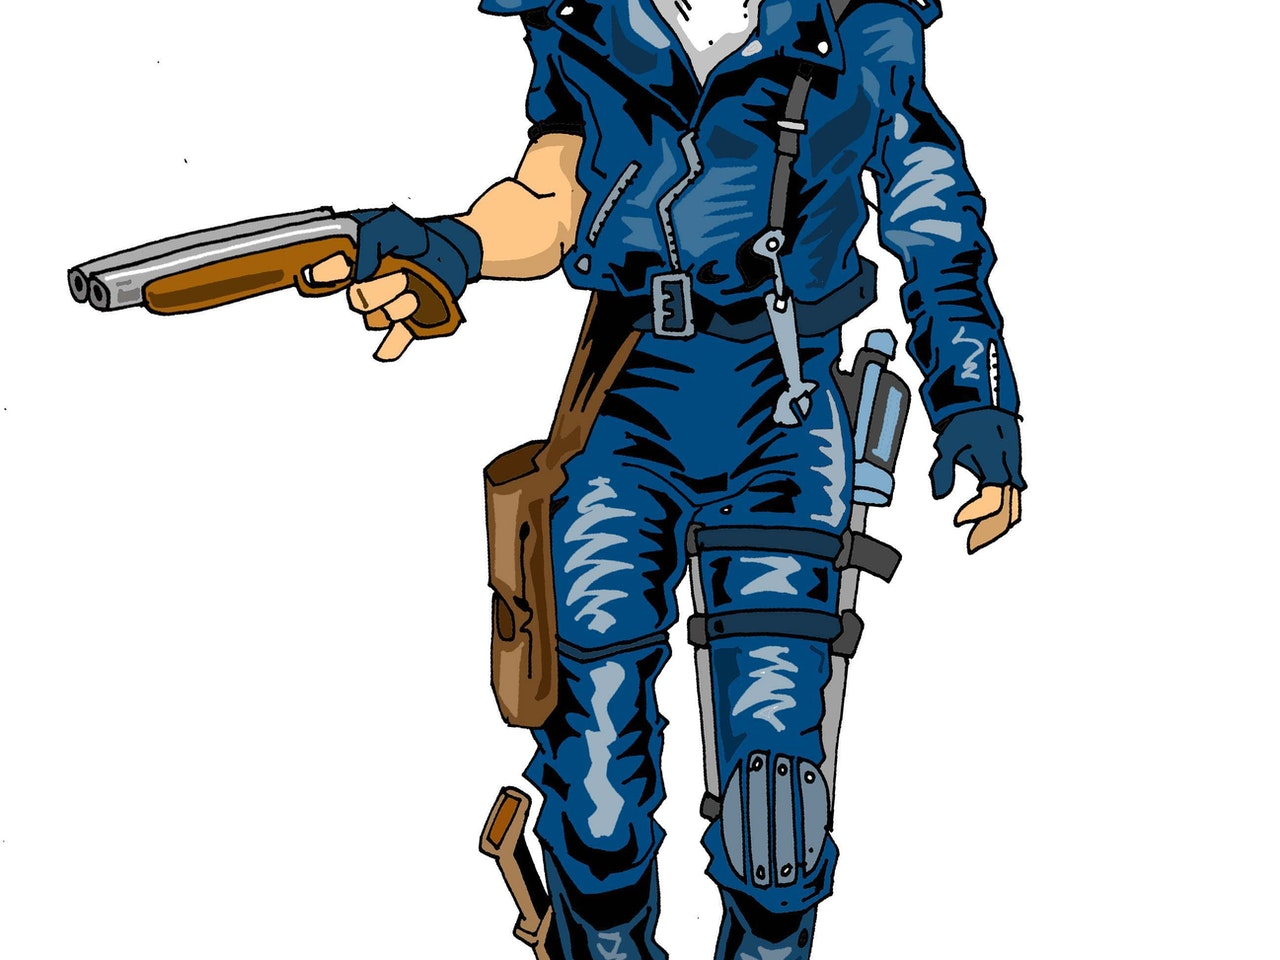 humorous comical colourful graphic cartoon anime comic strip sci fi fantasy road warrior apocalyptic dystopian shotgun thunderdome fury road